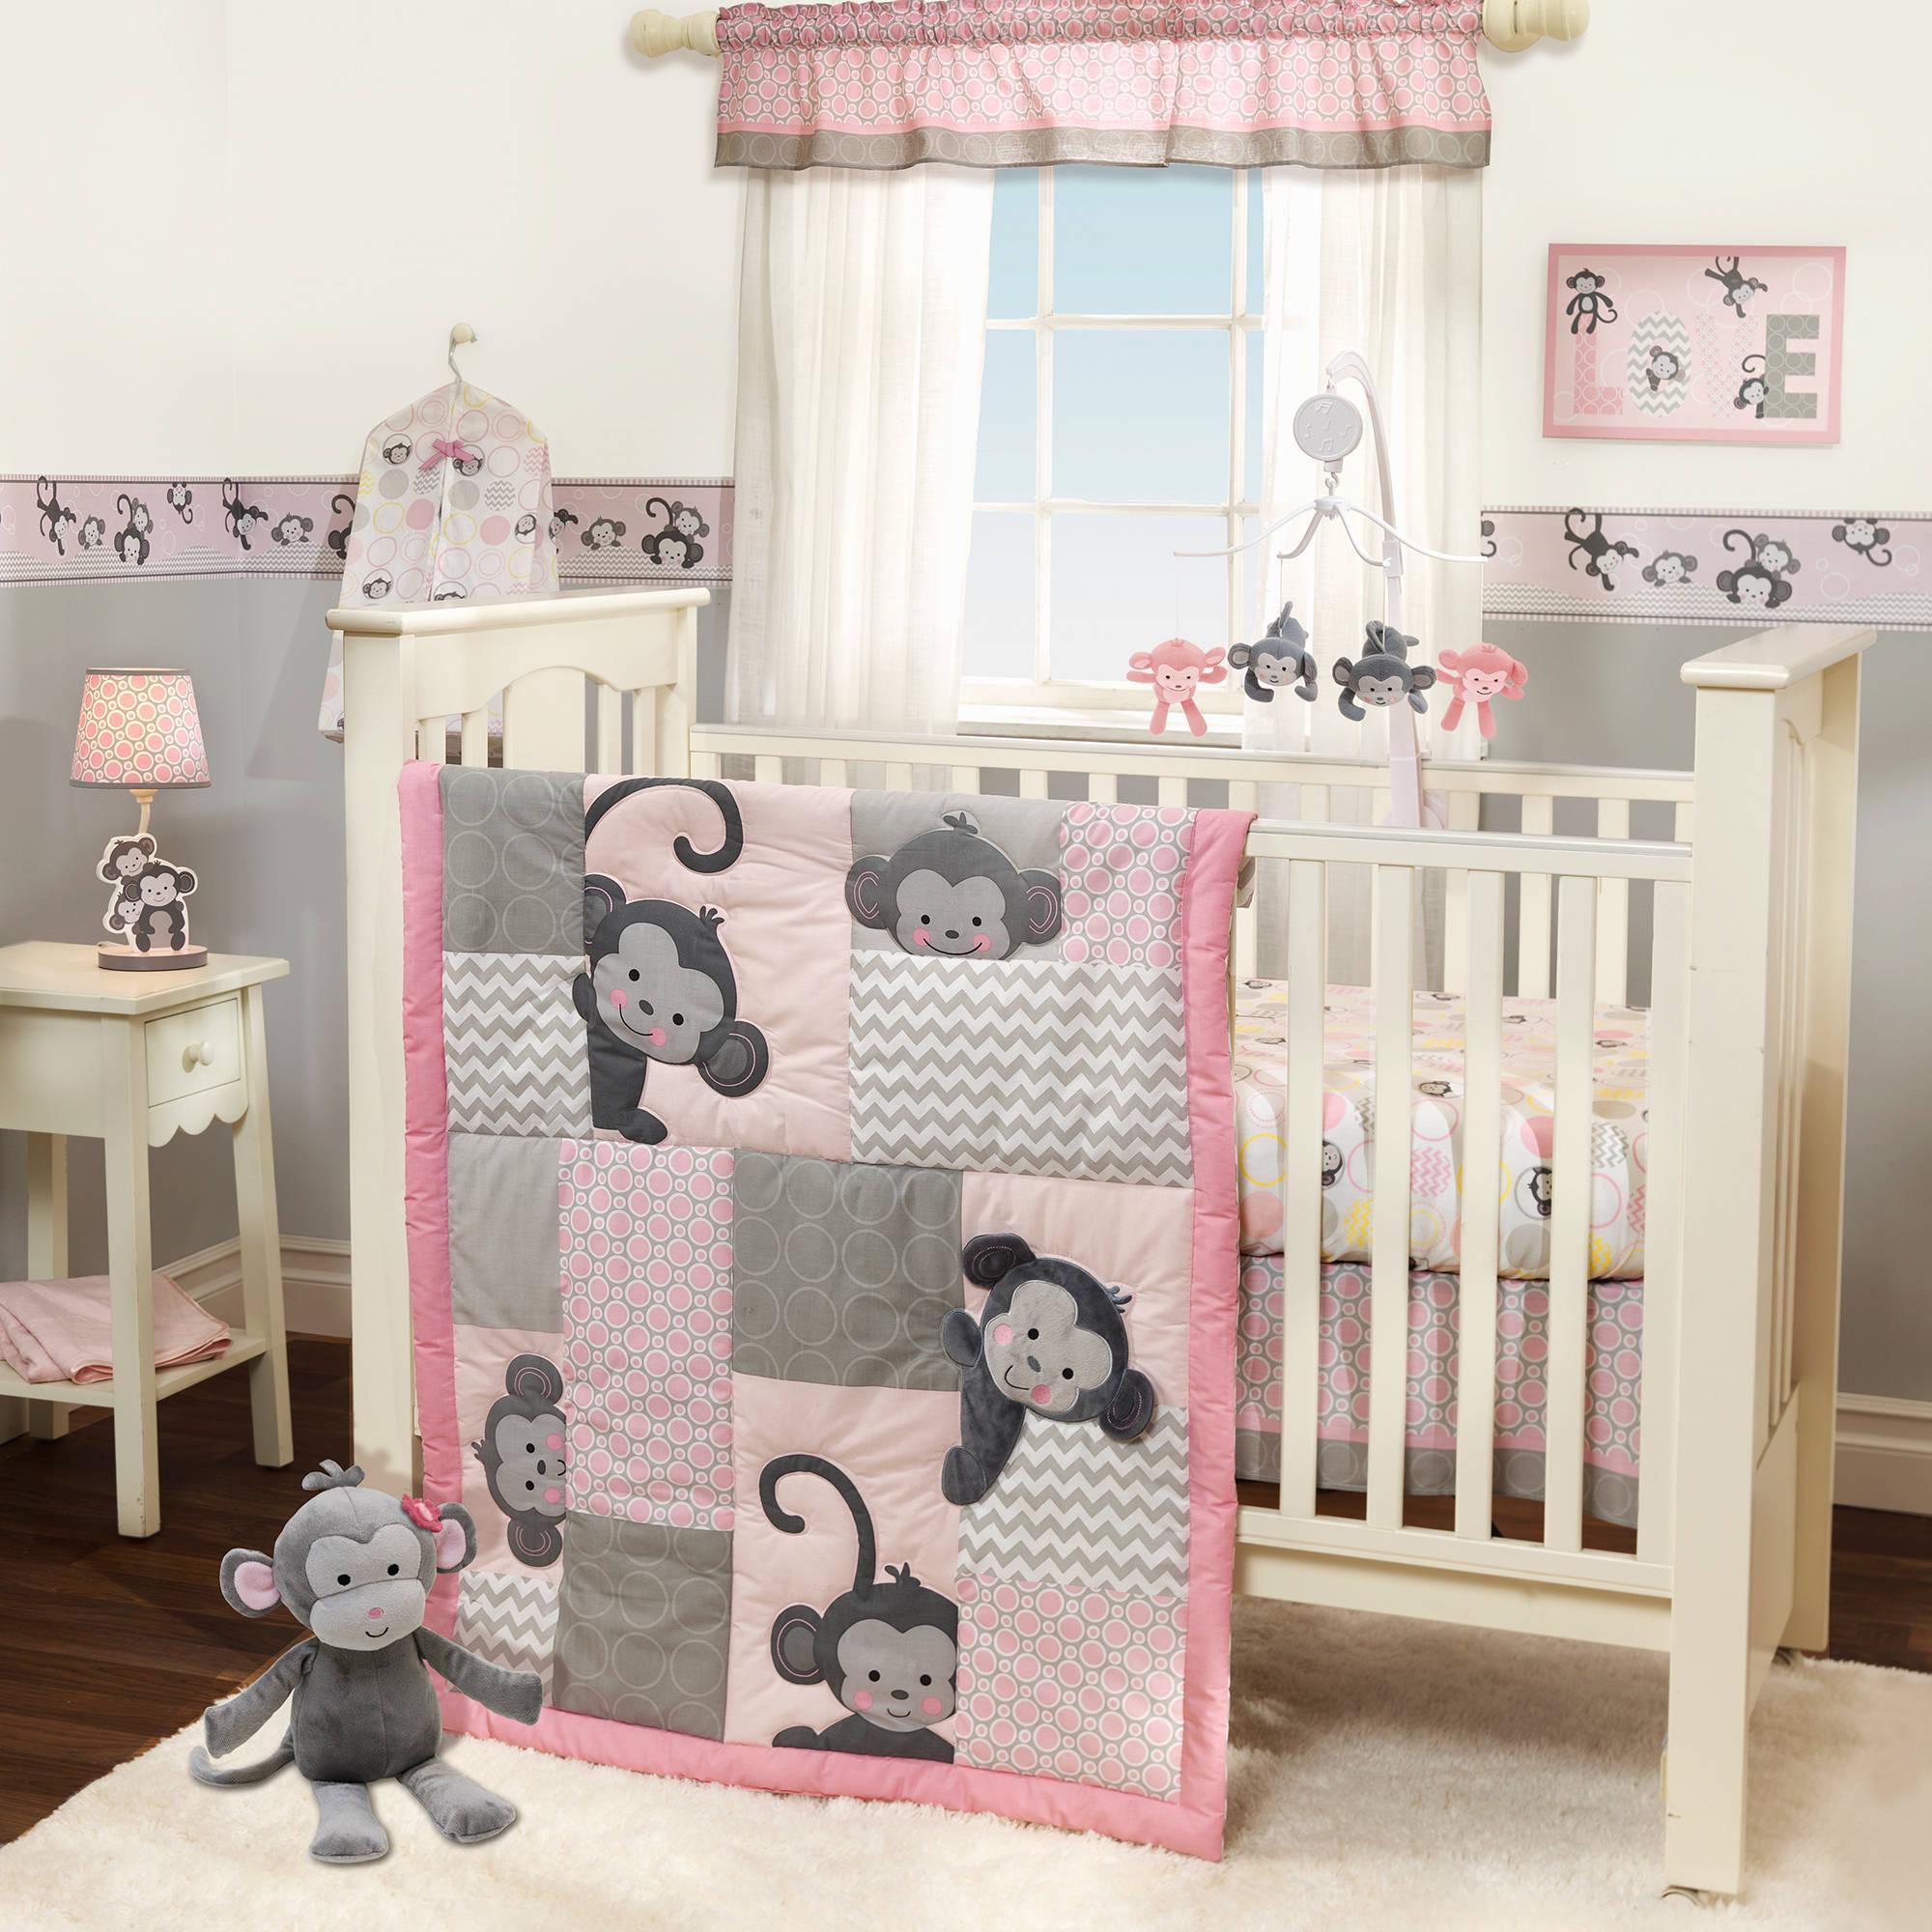 girl crib bedding disney pooh together forever 4-piece crib bedding set - walmart.com COMRQDQ